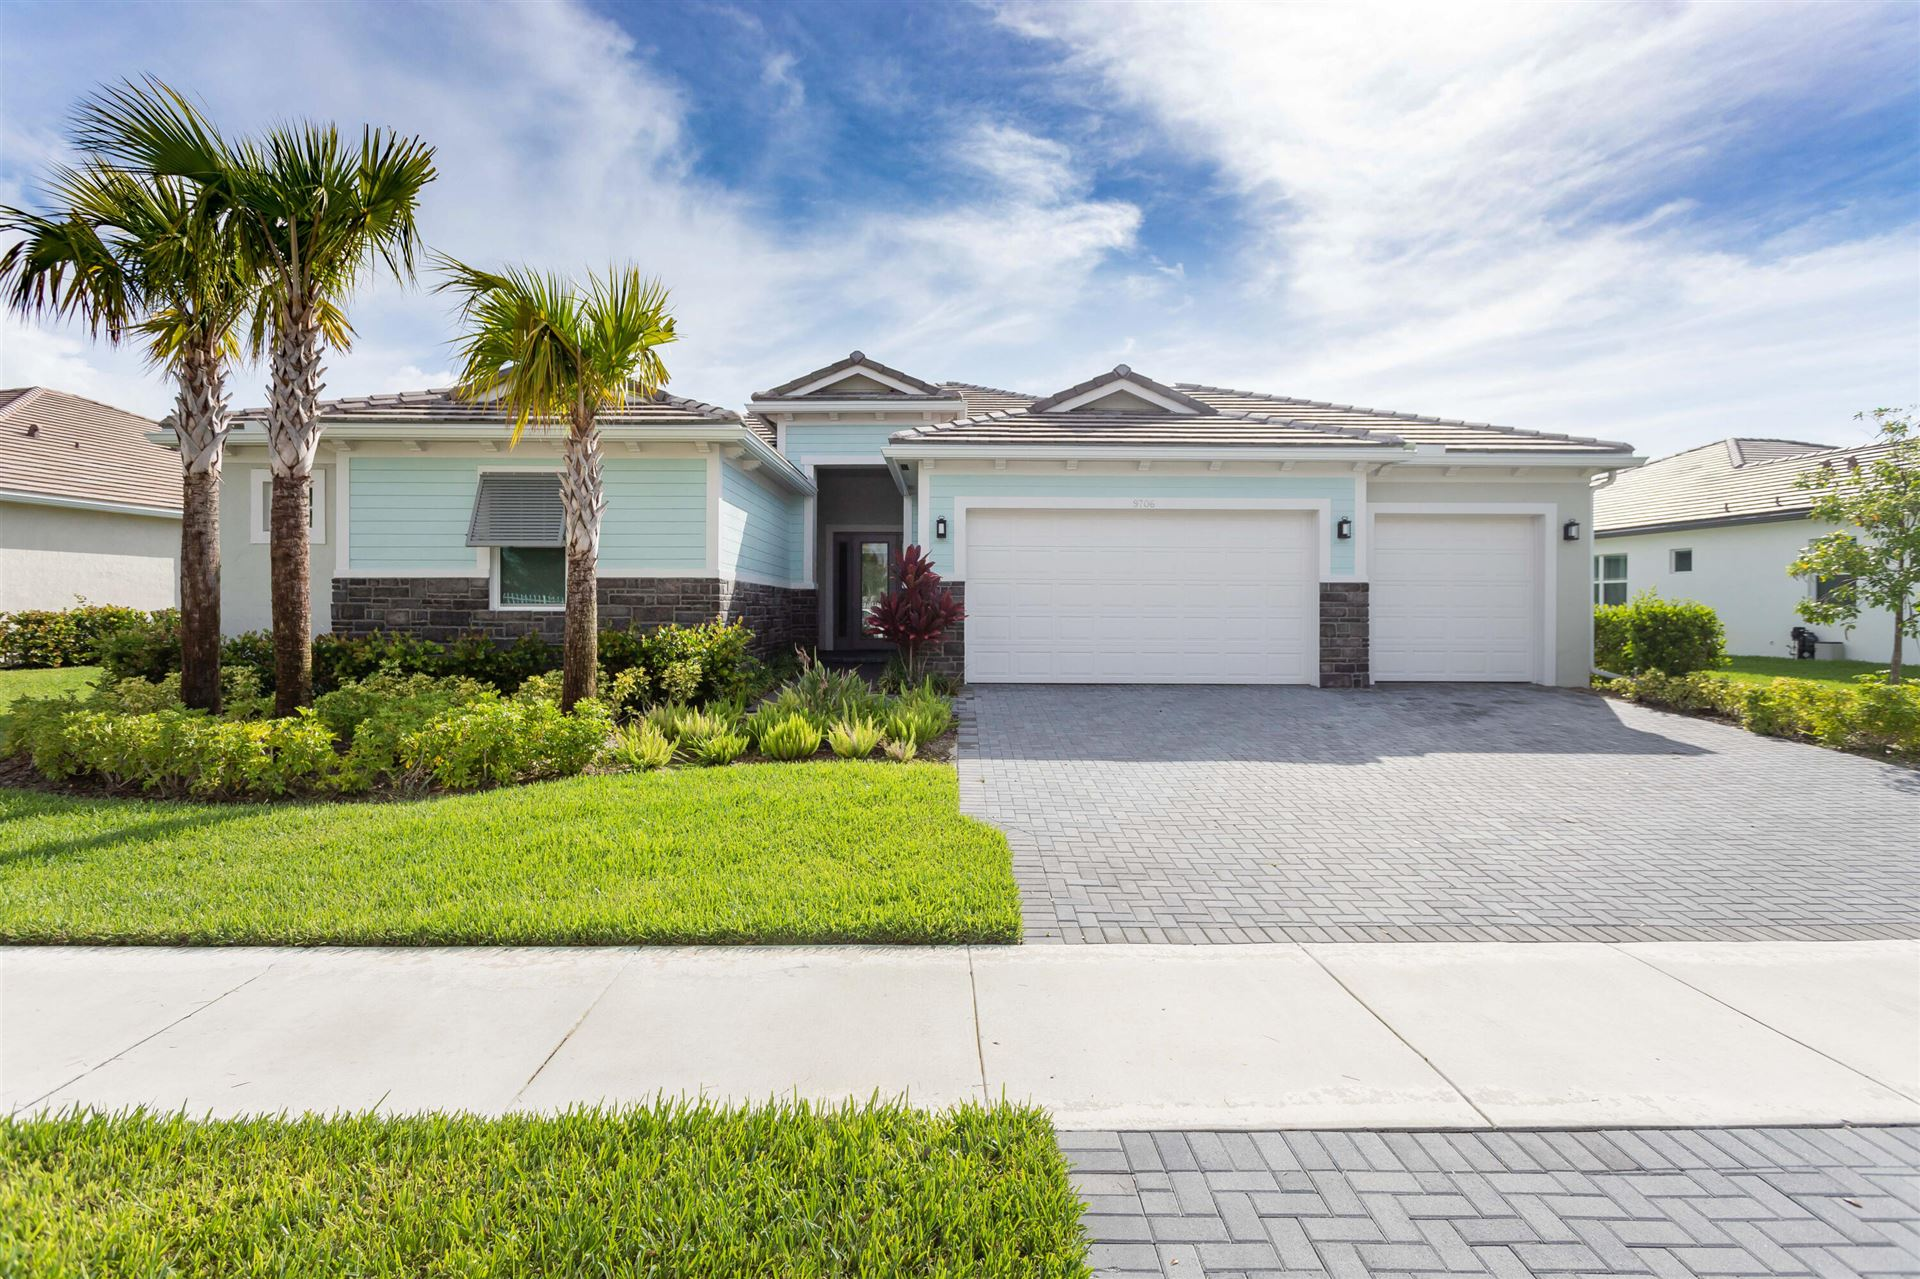 9706 Captiva Circle, Boynton Beach, FL 33437 - MLS#: RX-10734799